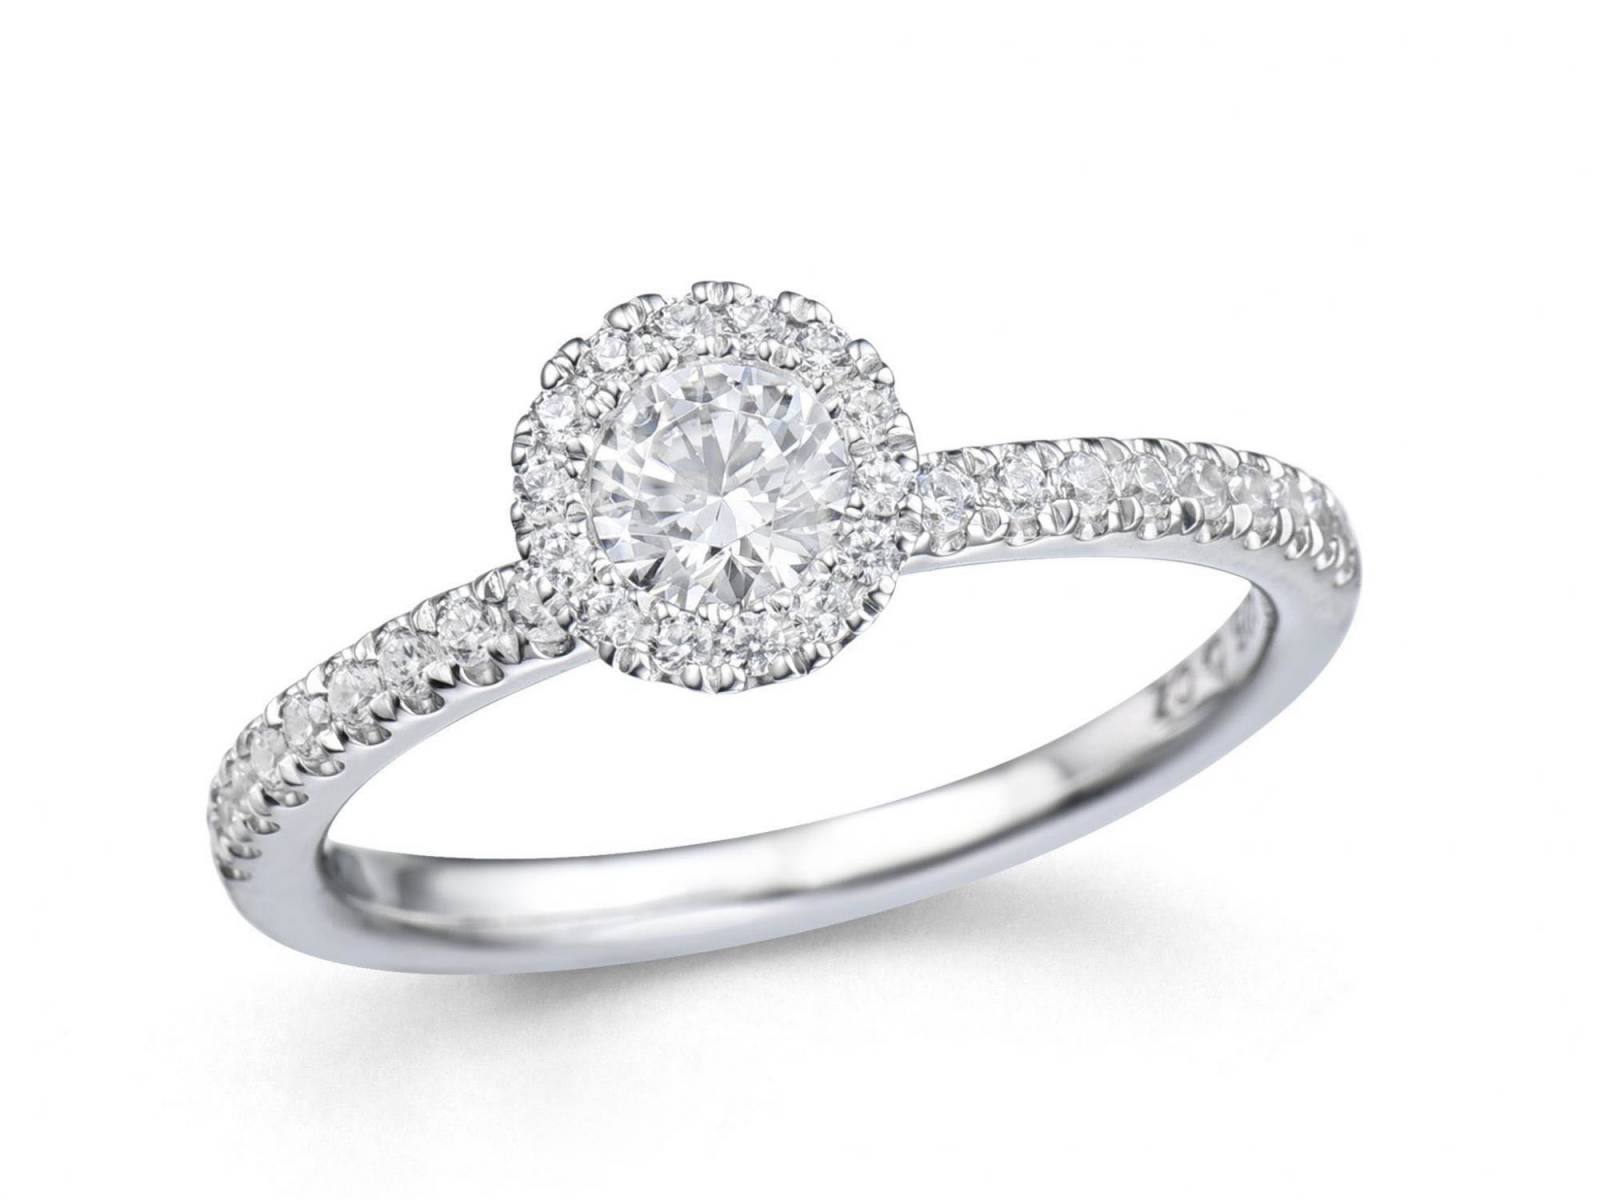 Juwelen Vanquaethem - House of Weddings (7)